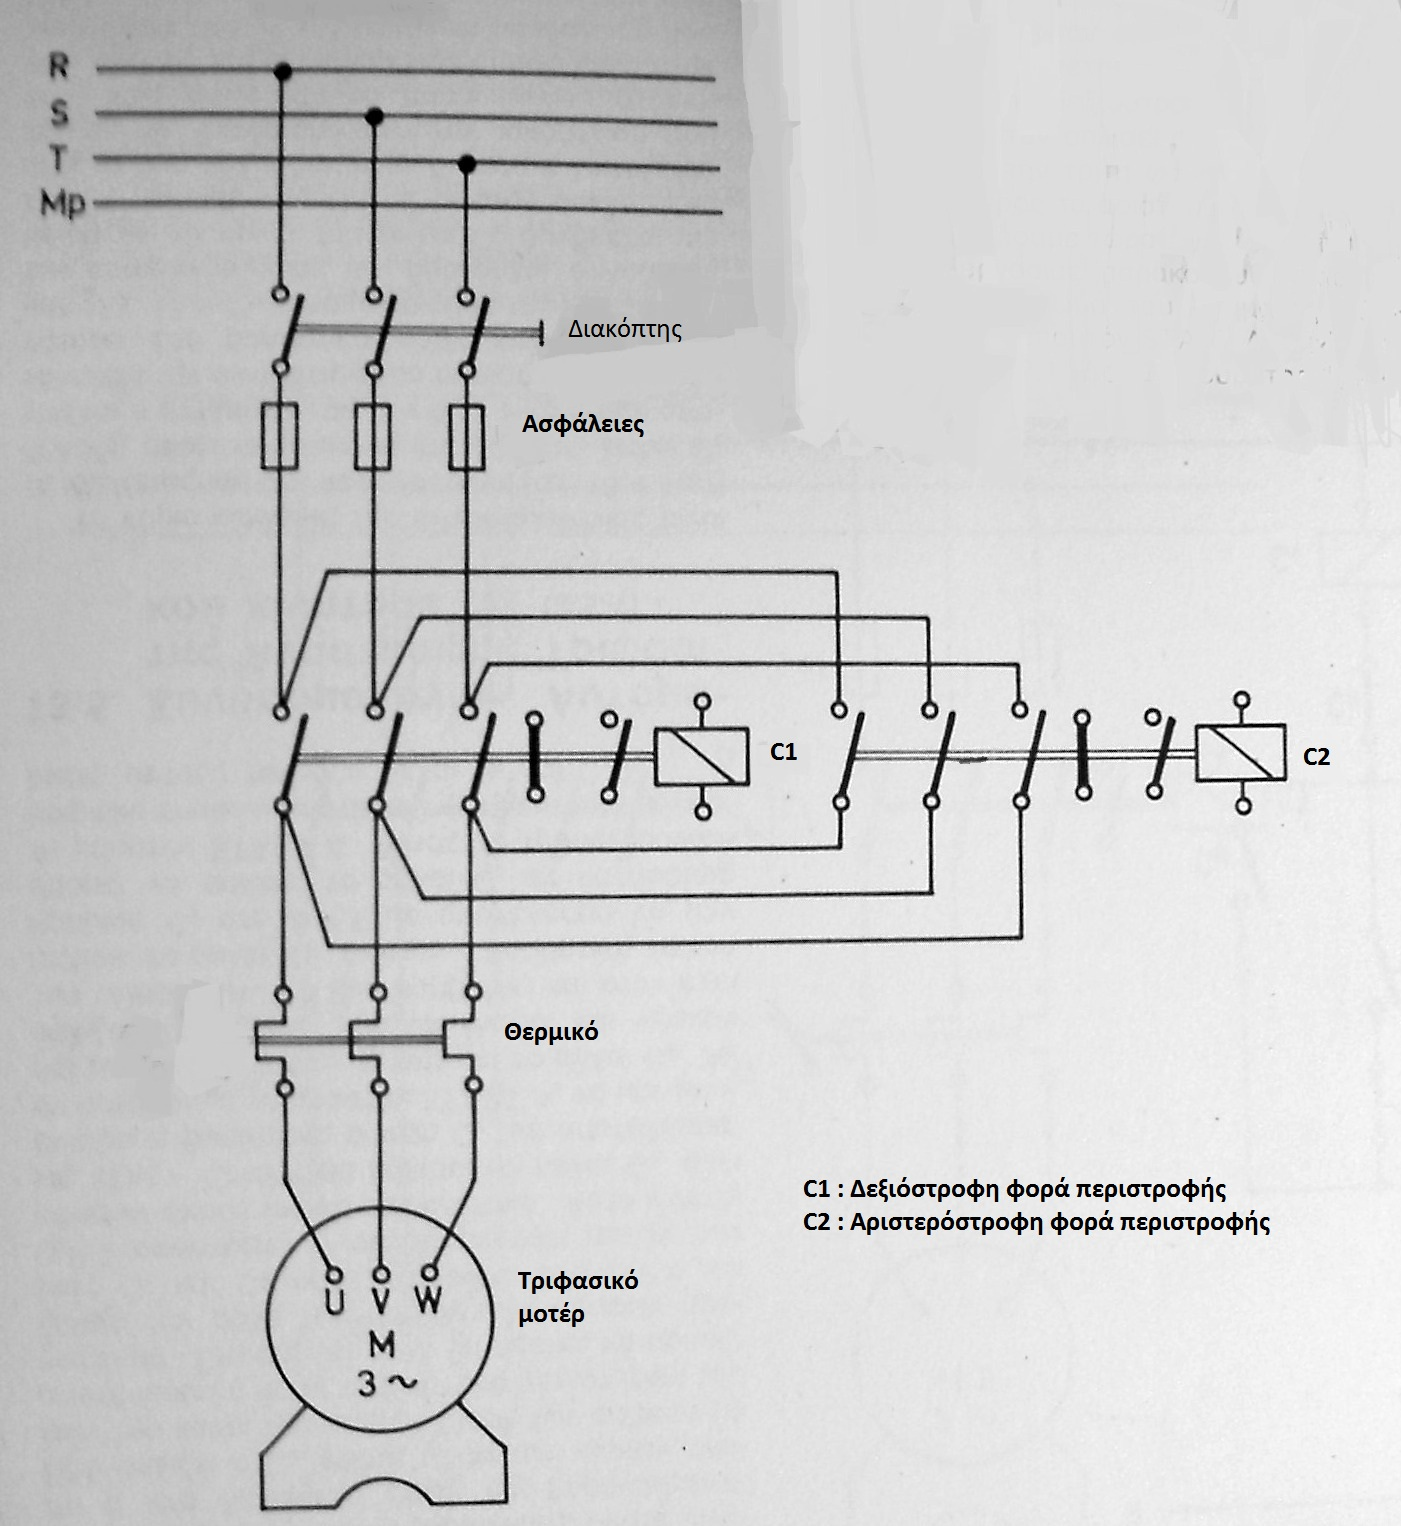 3 Phase Power Wiring Diagram For Led Tube Lights Rotation Ac